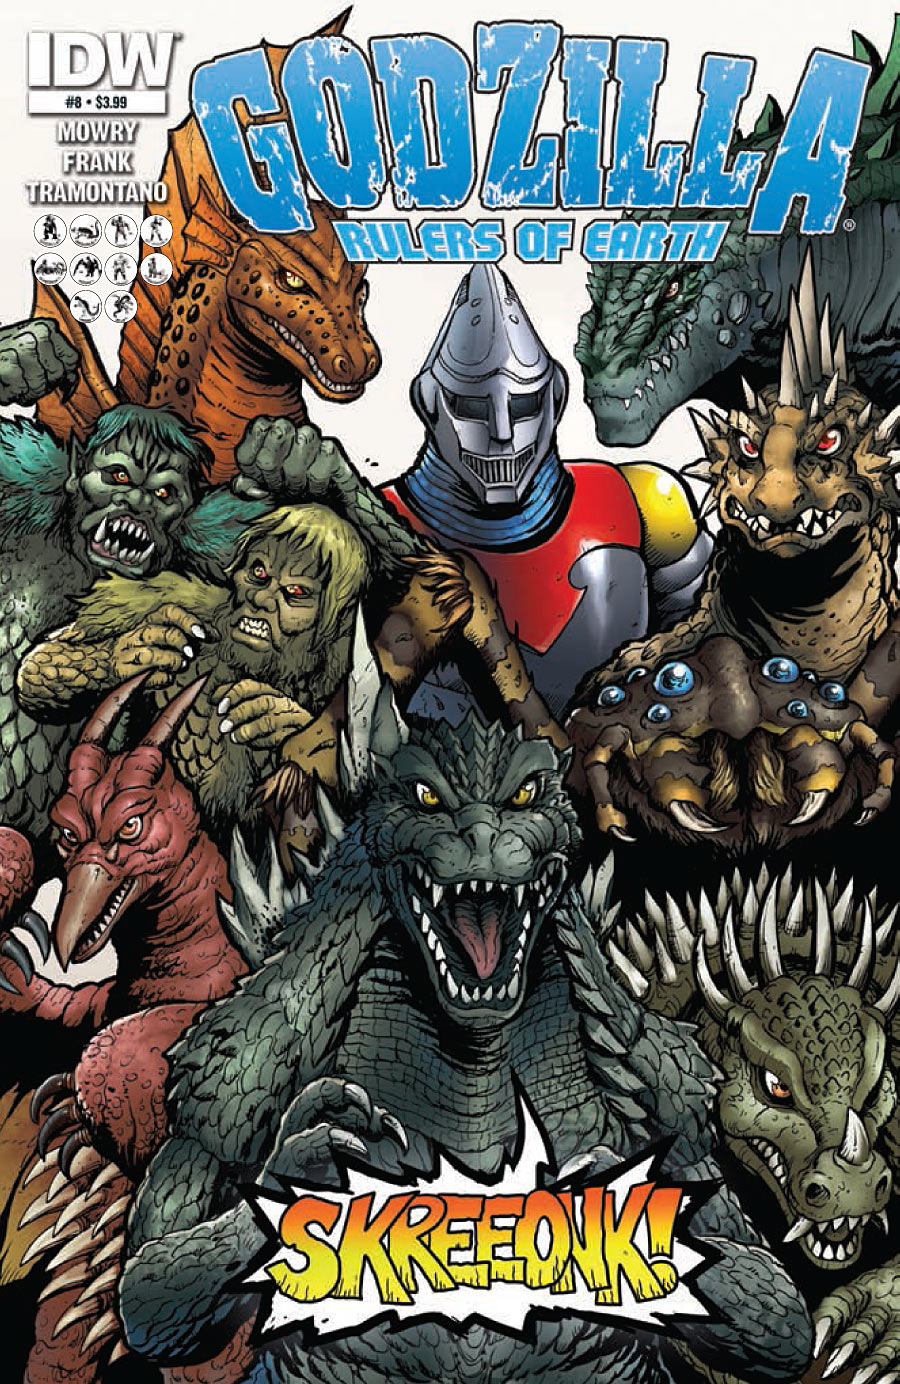 Godzilla: Rulers of Earth #8